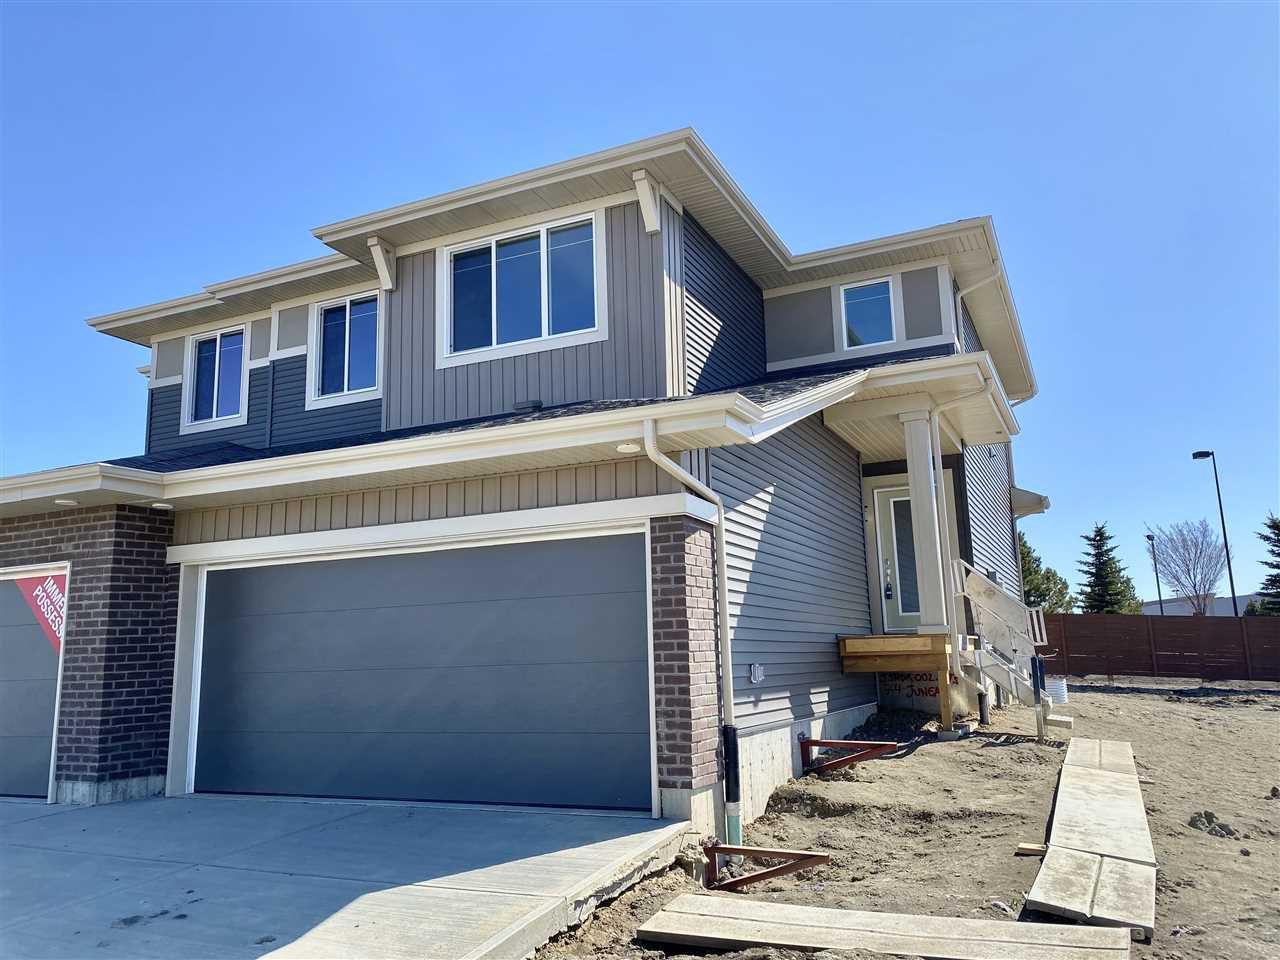 Main Photo: 74 JUNEAU Way: St. Albert House Half Duplex for sale : MLS®# E4196050